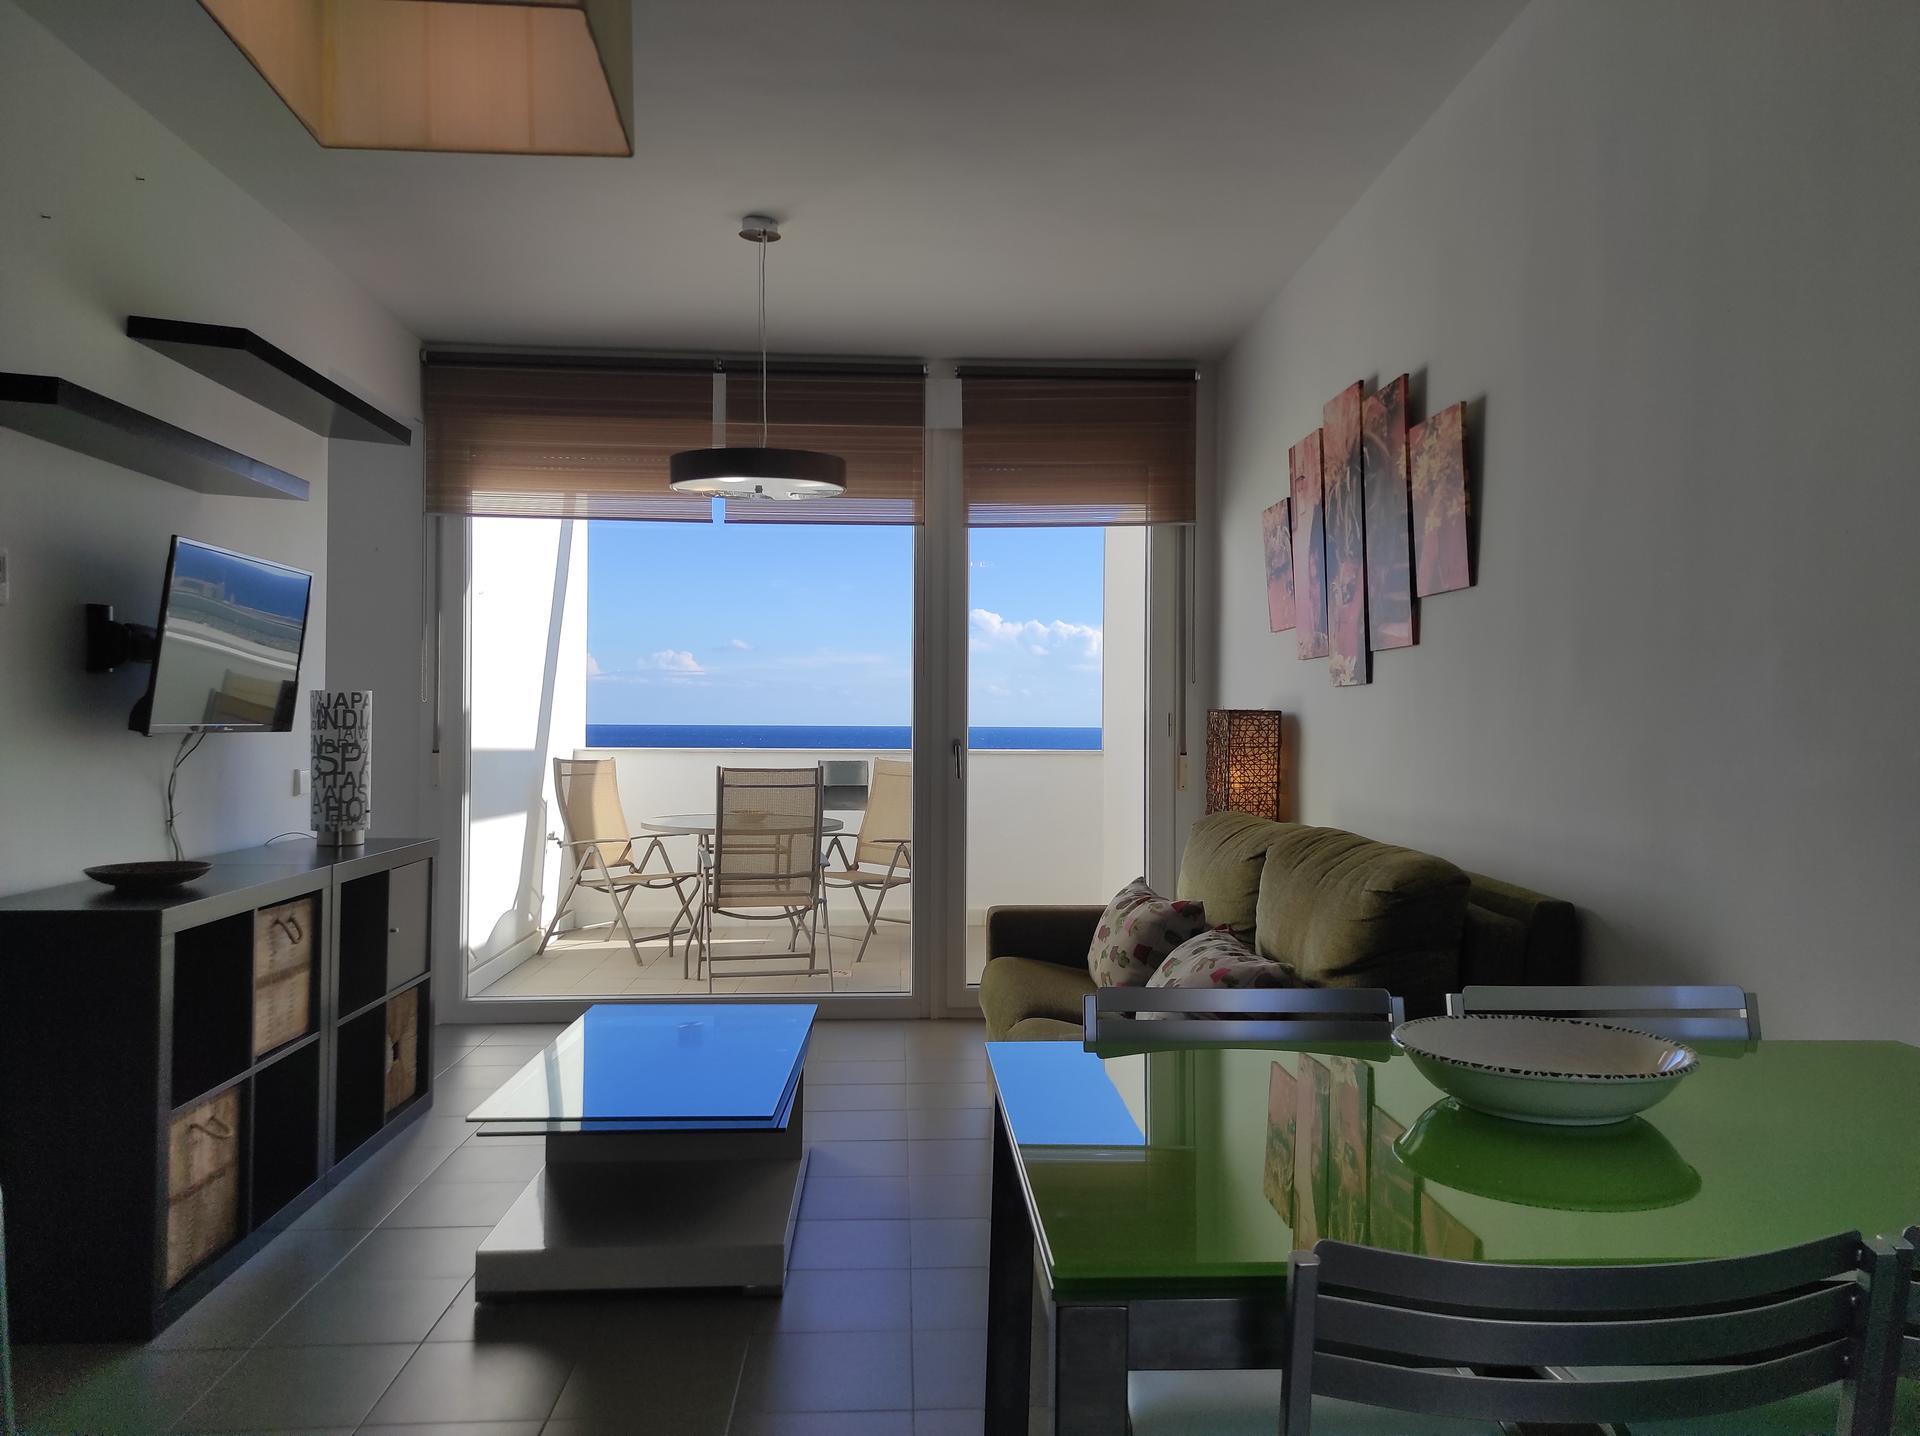 Apartamento -                                       Las Negras -                                       1 dormitorios -                                       4 ocupantes